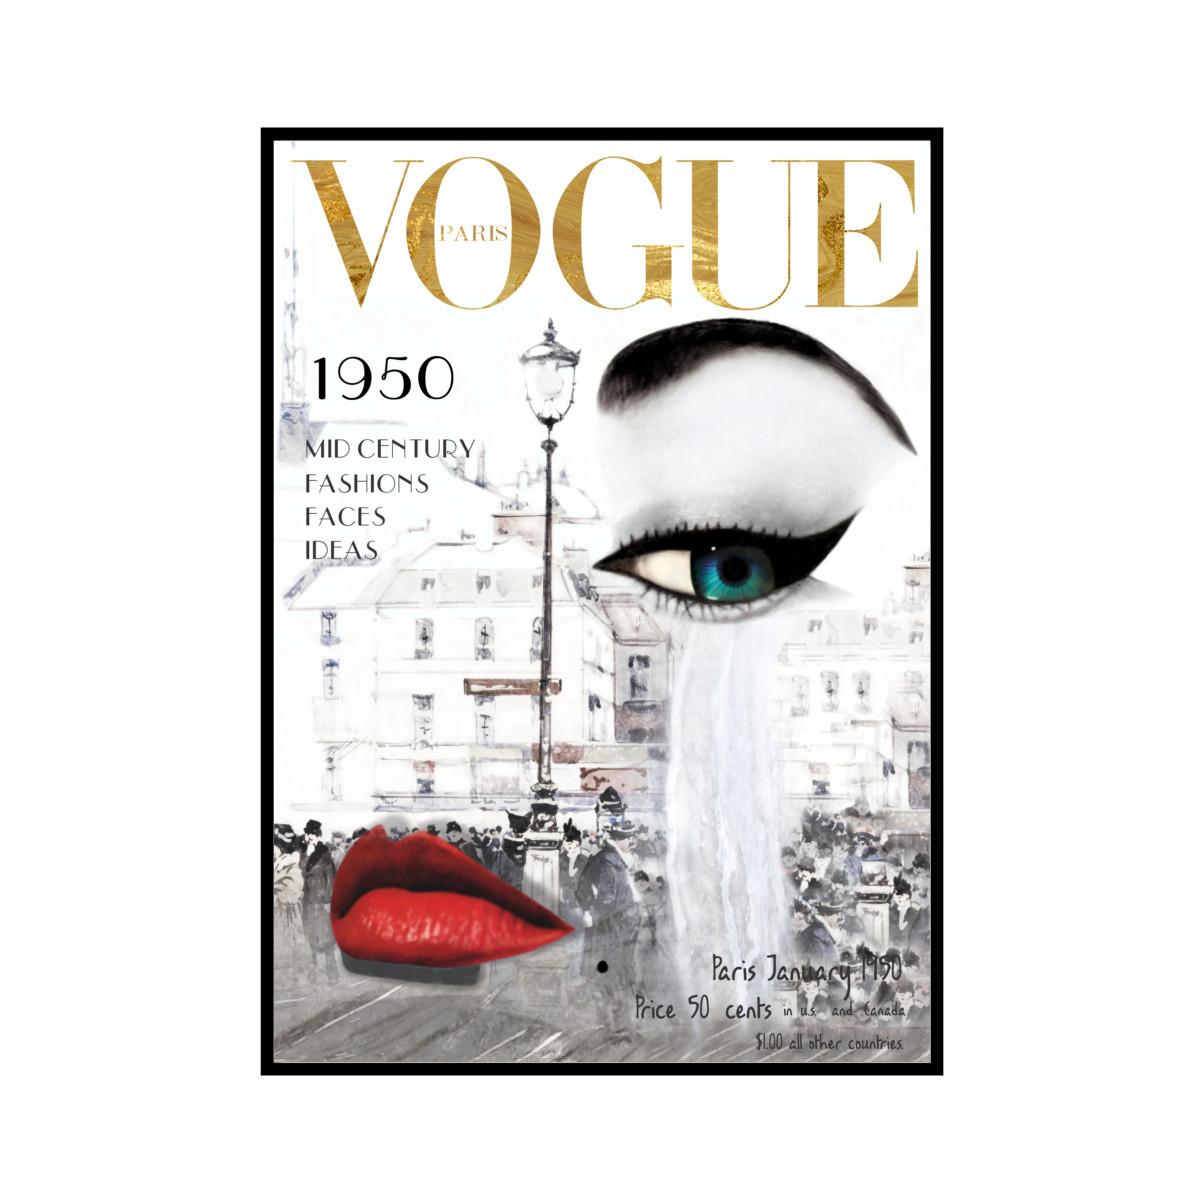 """VOGUE GM"" P1950 - VOGUEシリーズ [SD-000580] A4サイズ ポスター単品"